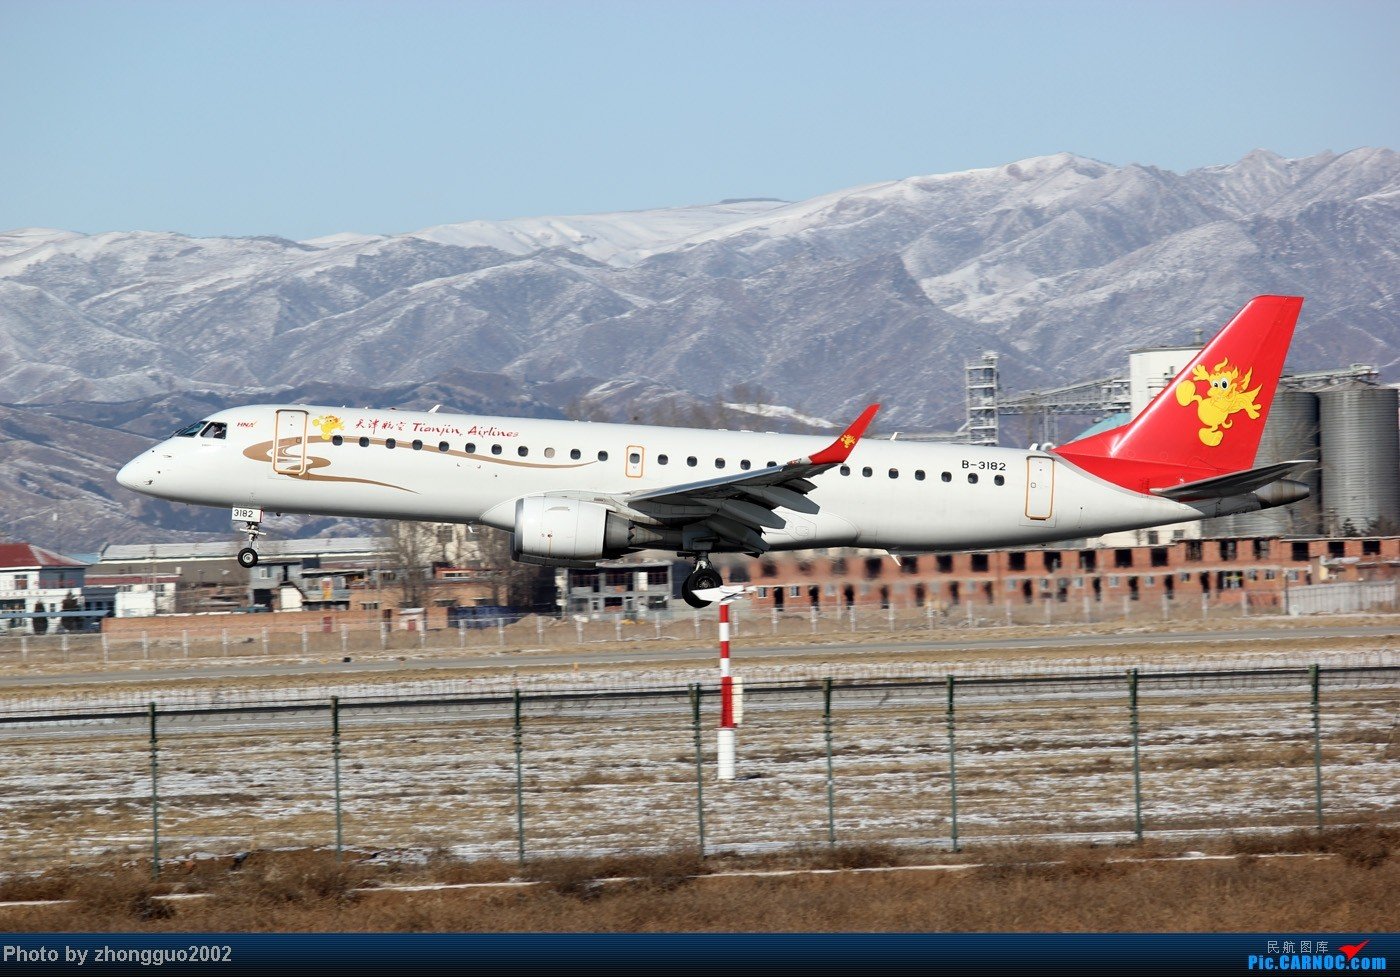 Re:[原创]灰鼻子的春哥第一次拍到,还有其他灰机。 EMBRAER E-190 B-3182 中国呼和浩特白塔国际机场